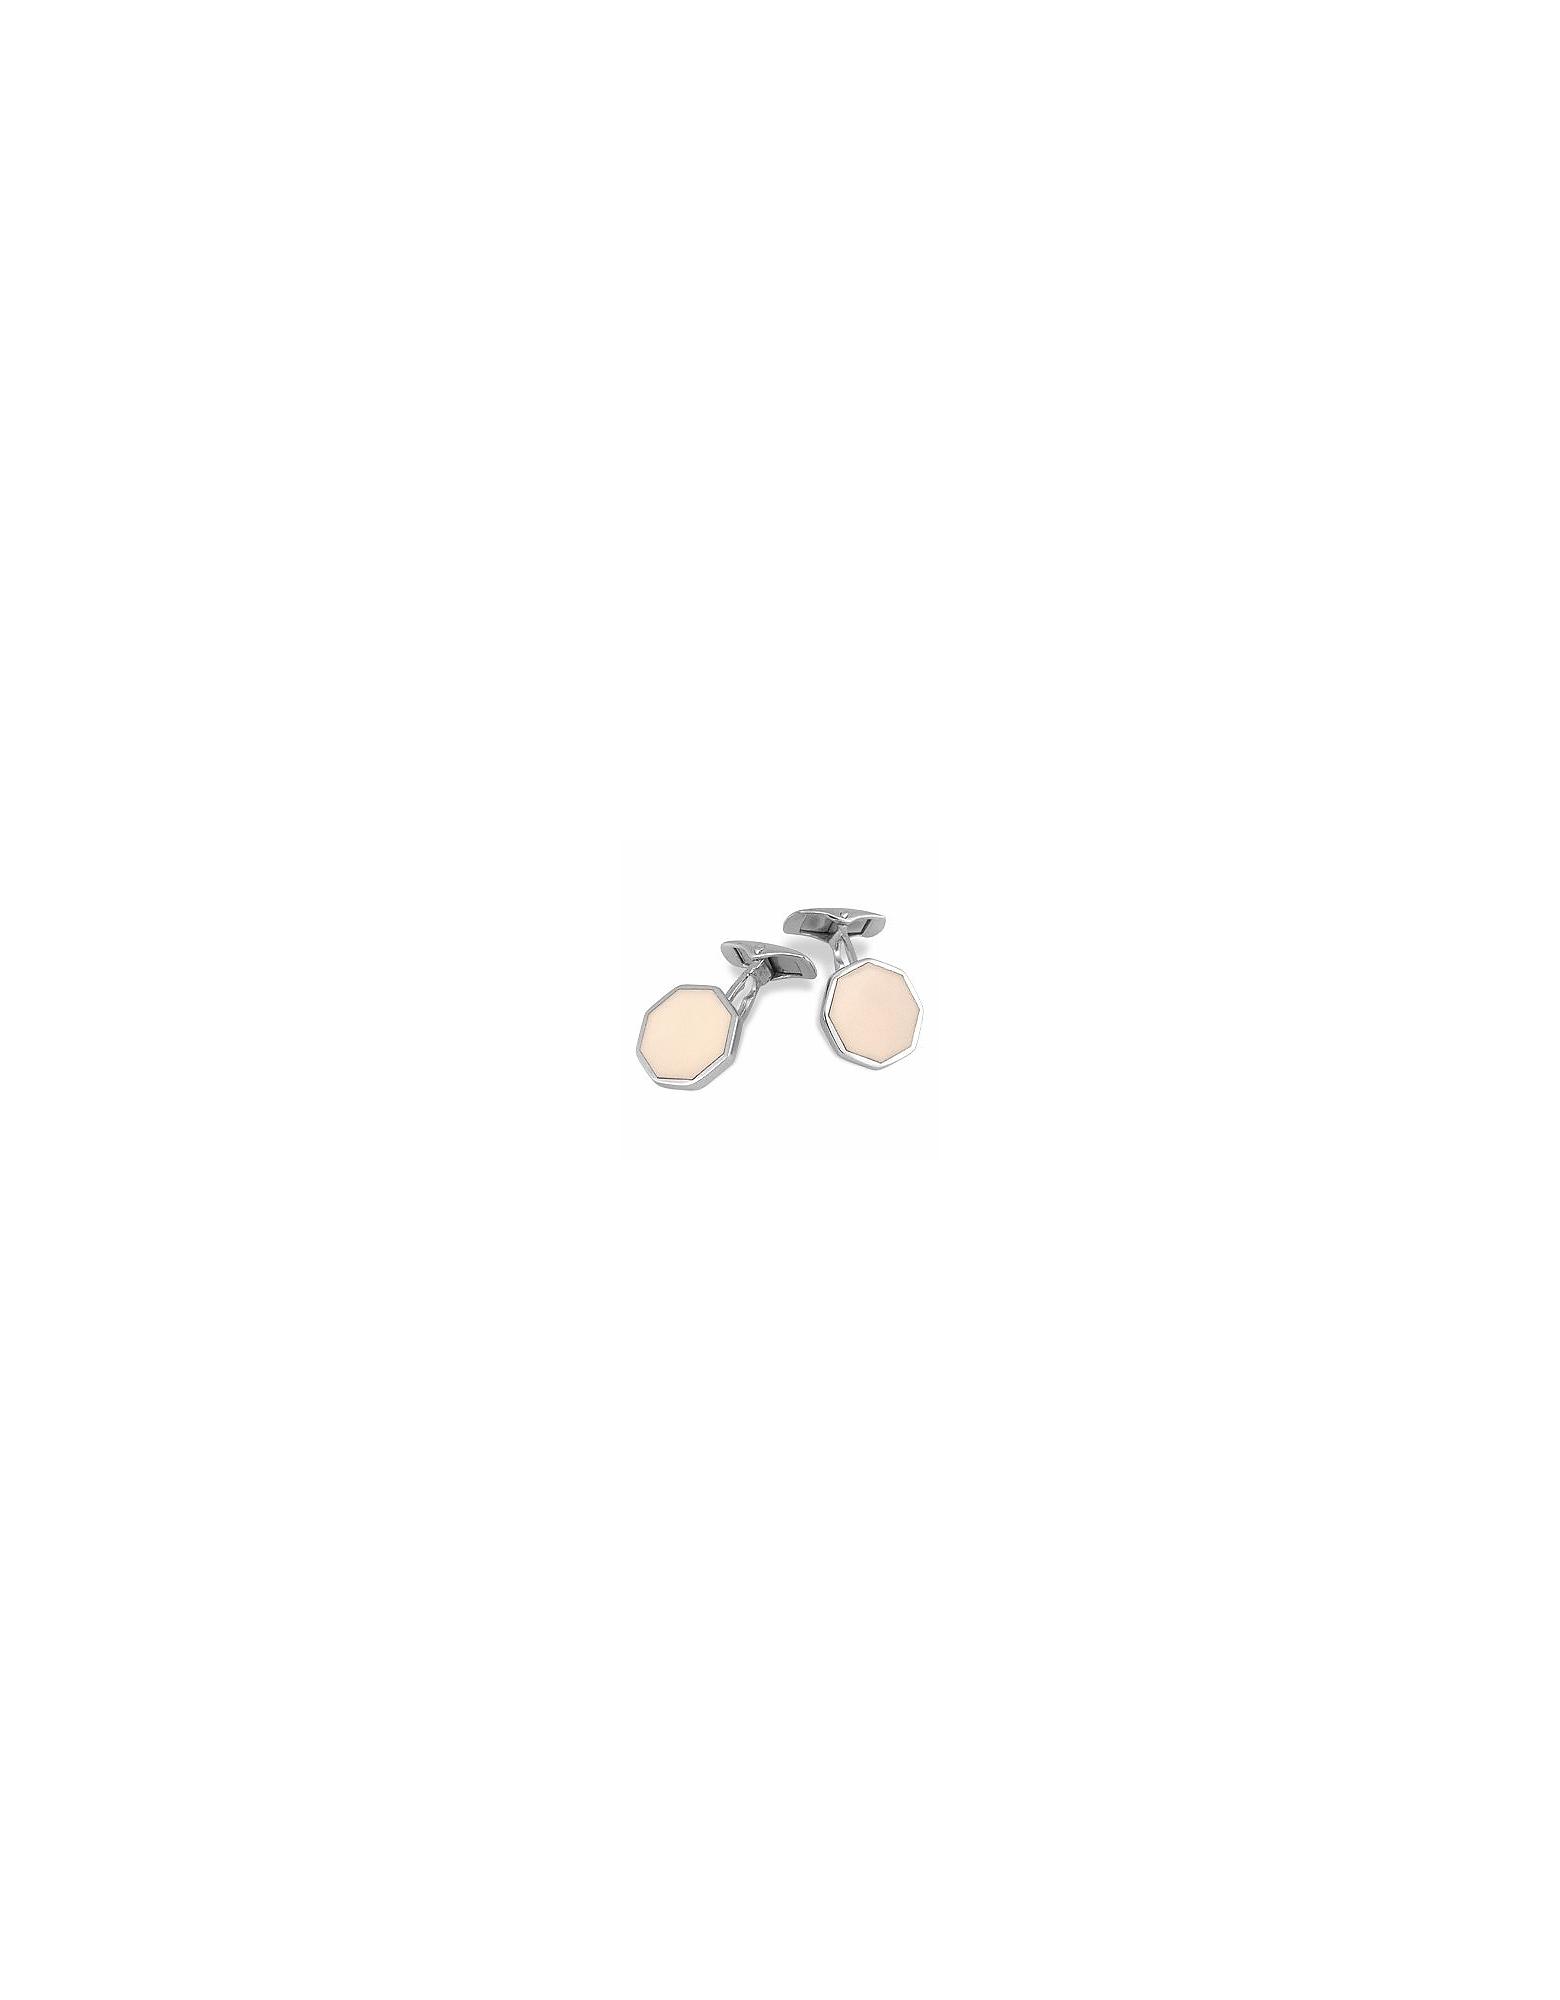 Forzieri Cufflinks, DiFulco Line Octagonal Sterling Silver Cufflinks